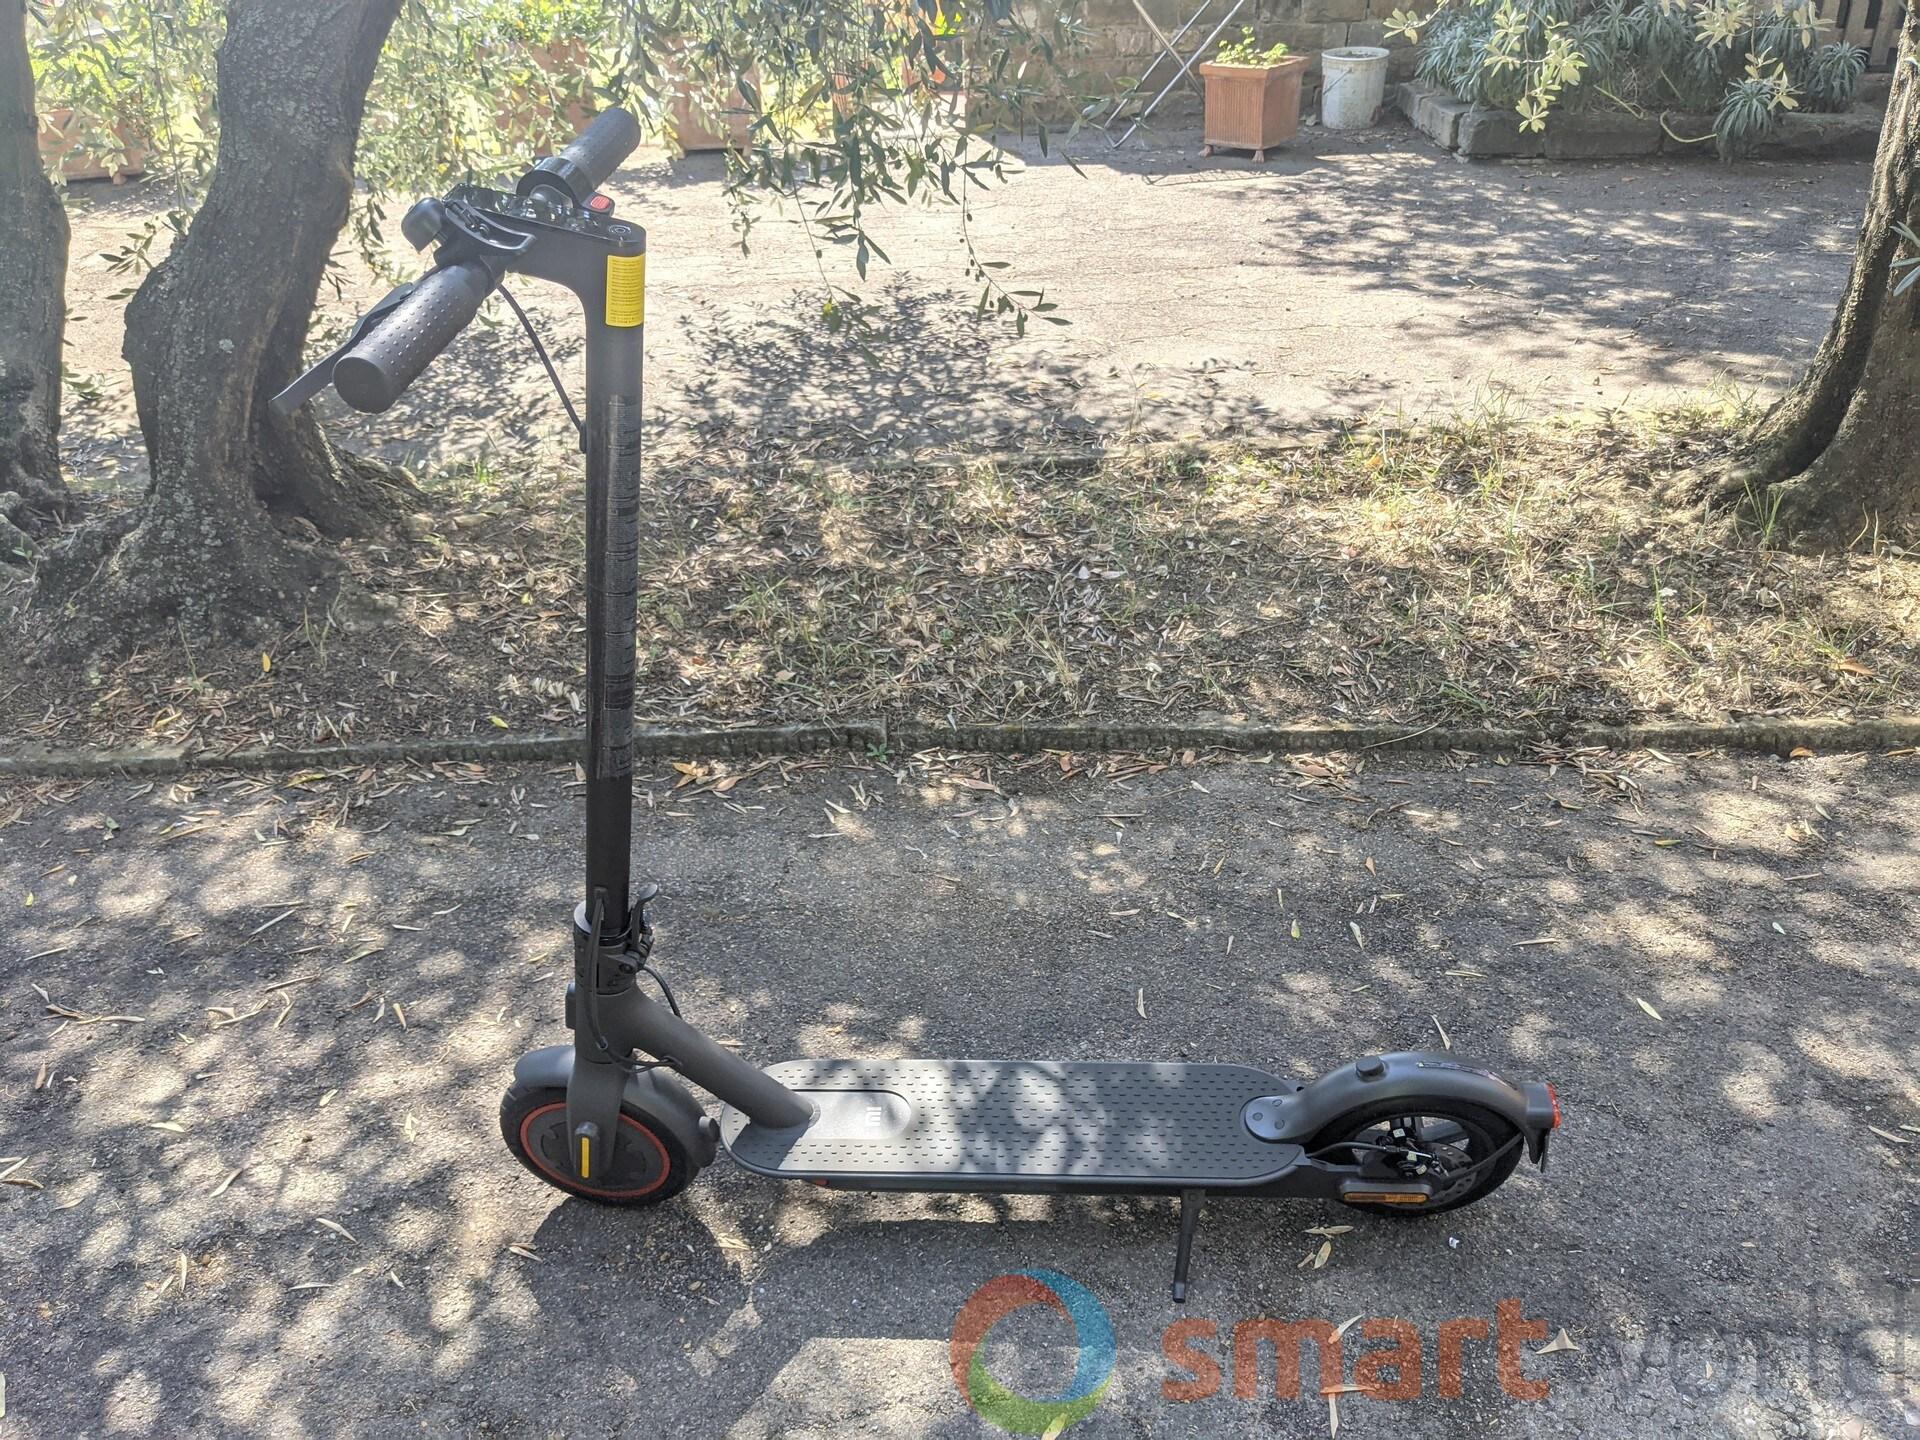 xiaomi mi electric scooter pro 2 (13)